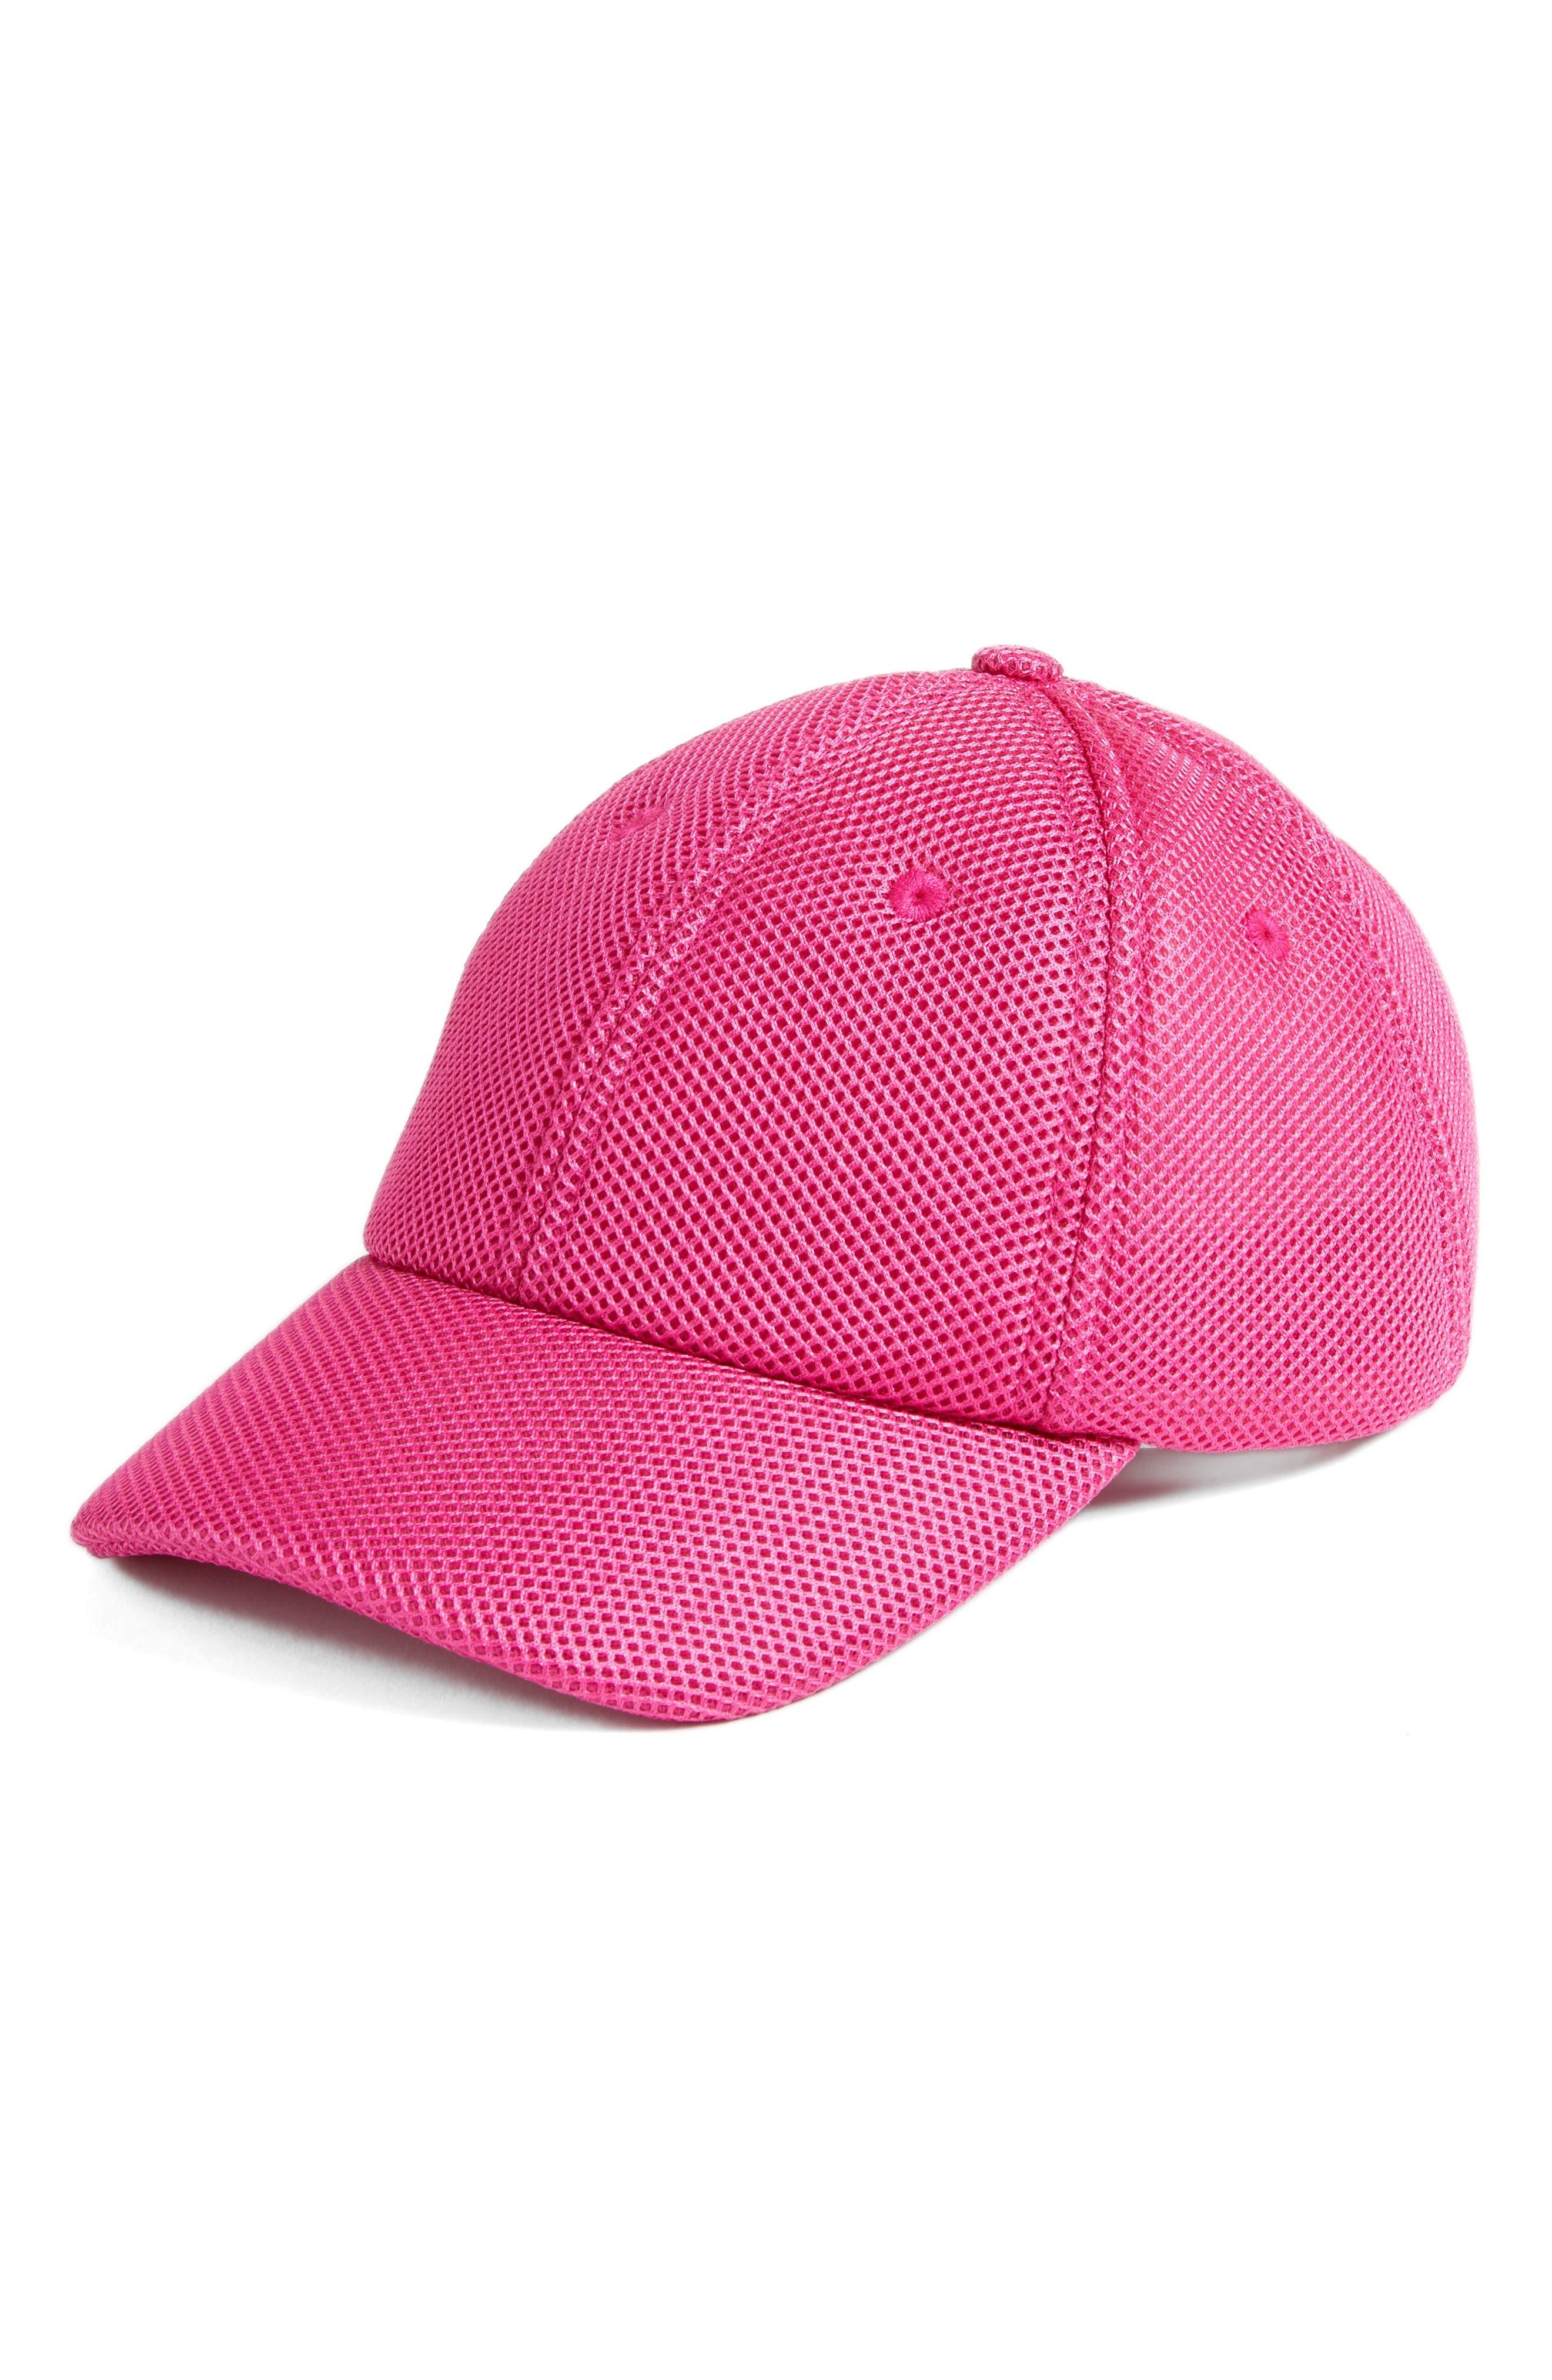 IVY PARK® Mesh Baseball Cap